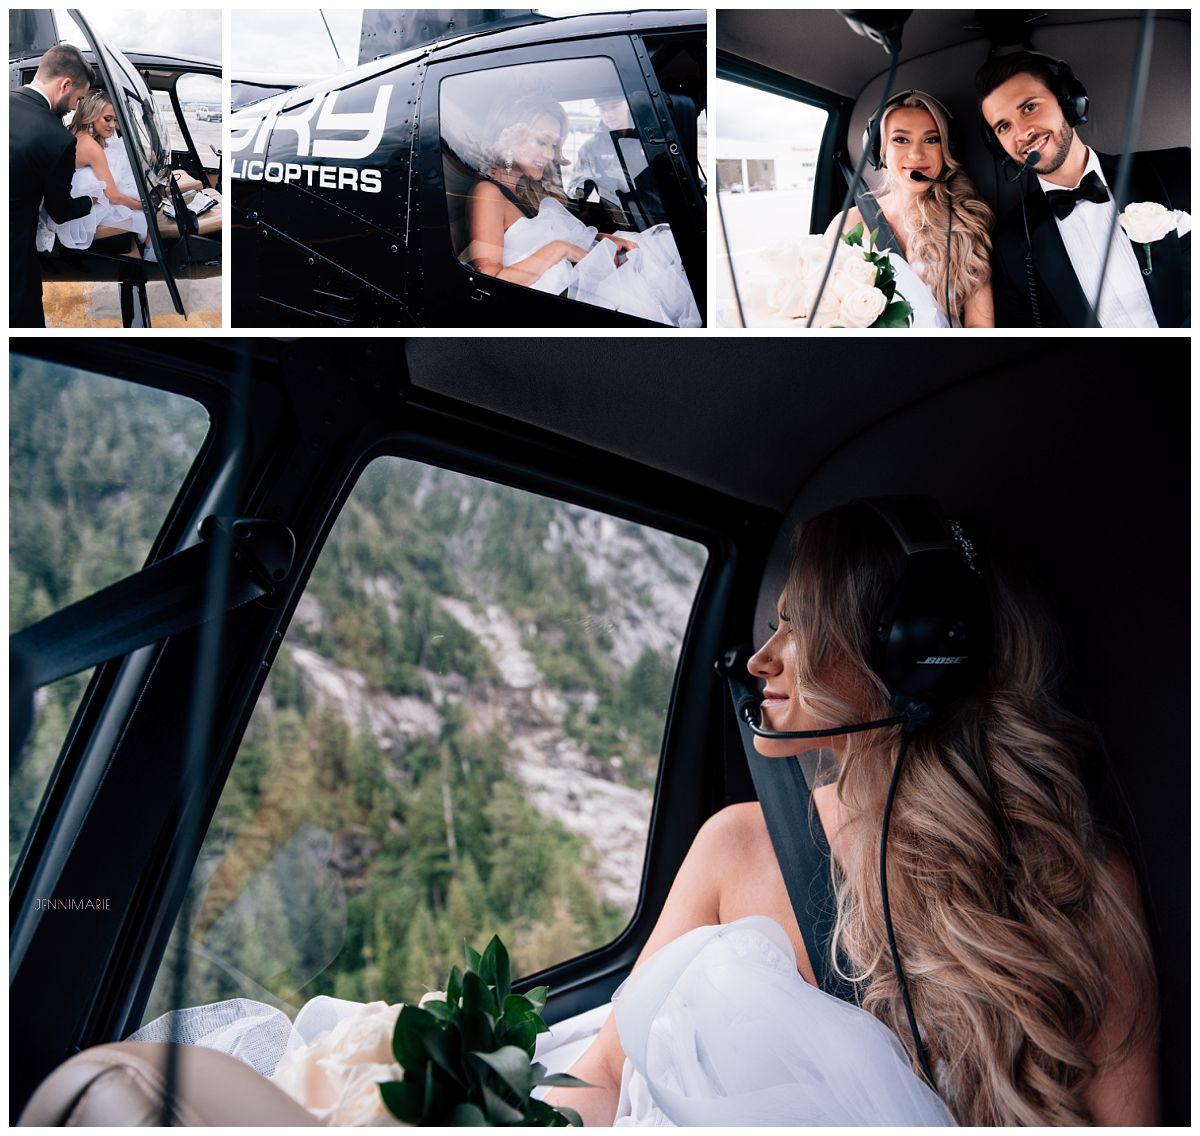 Sky Helicopter wedding portraits